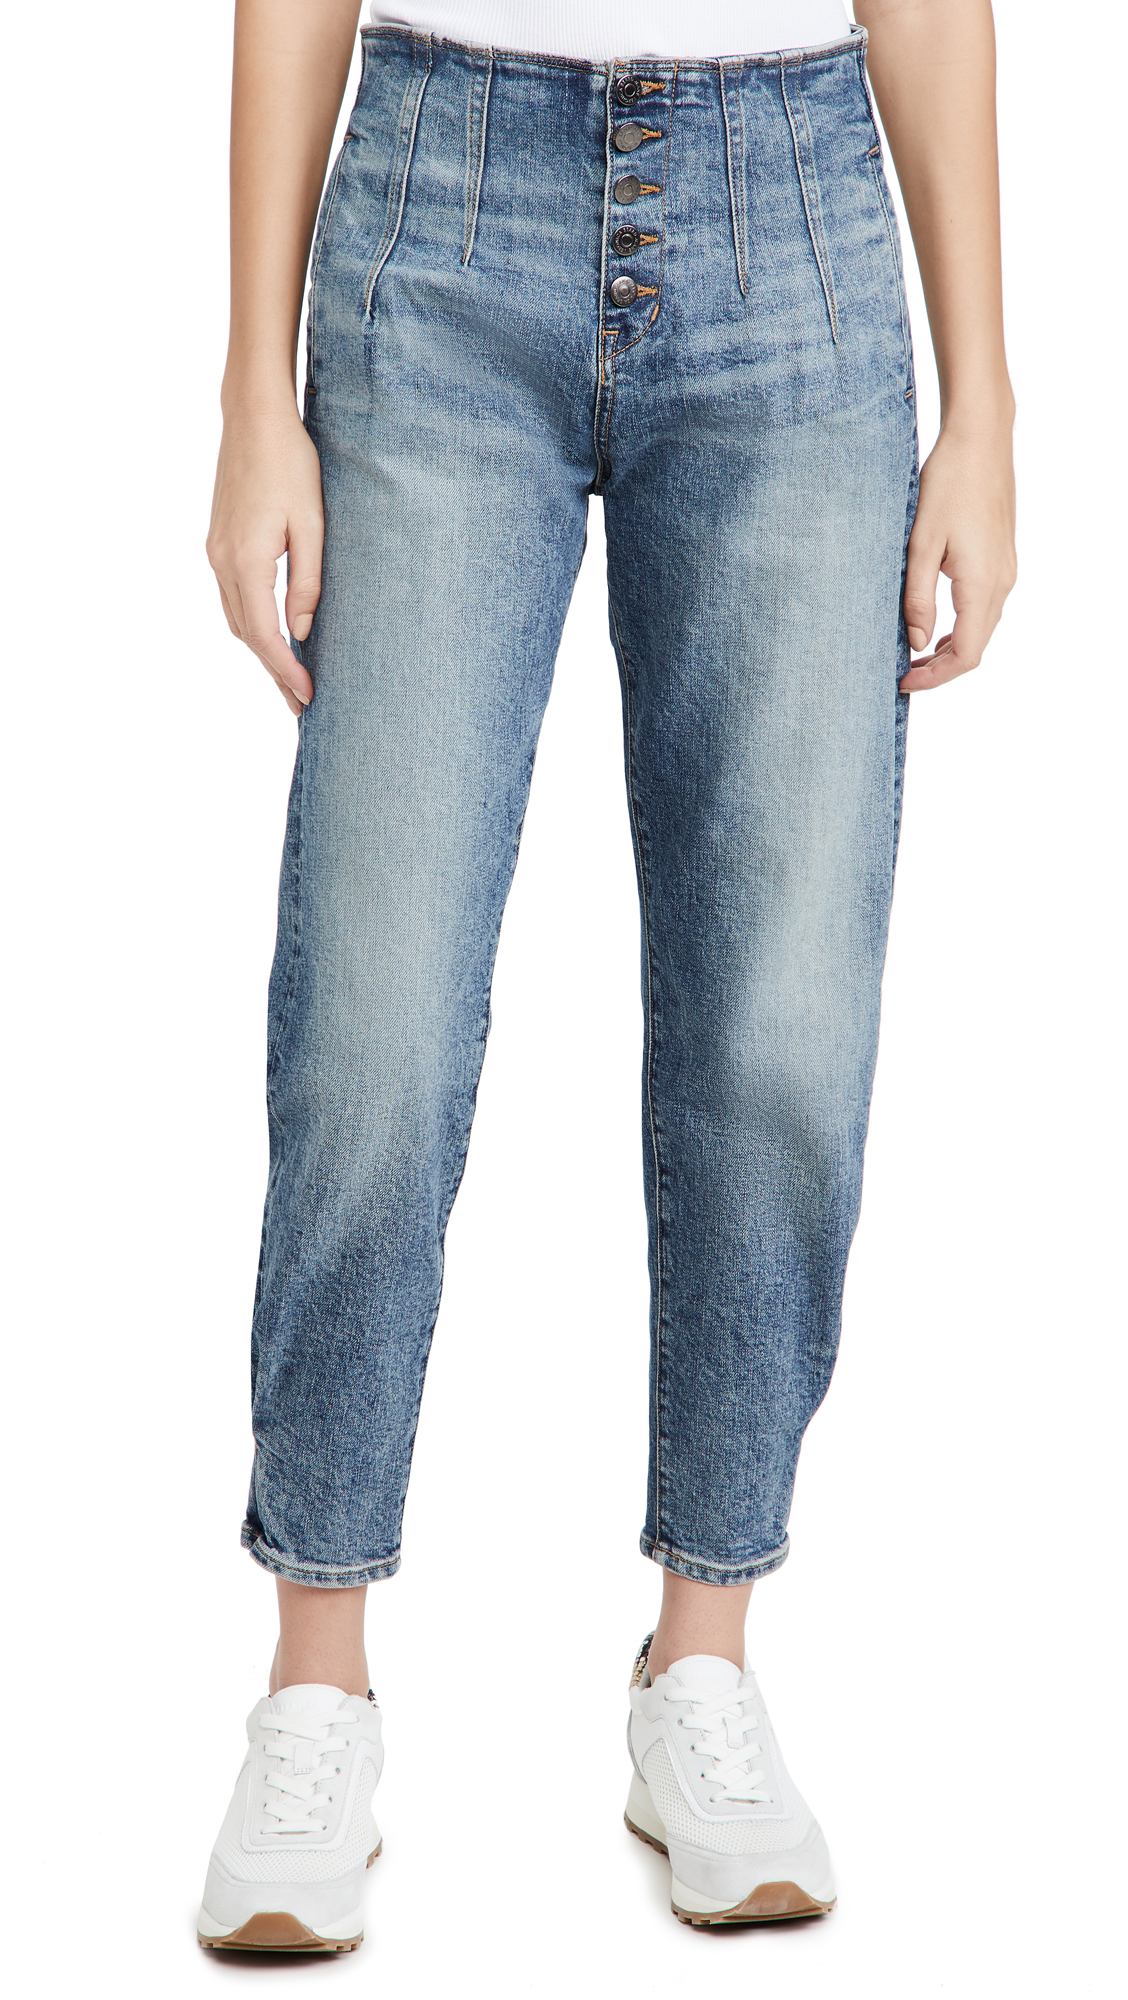 Veronica Beard Jean Nita Pegged Jeans